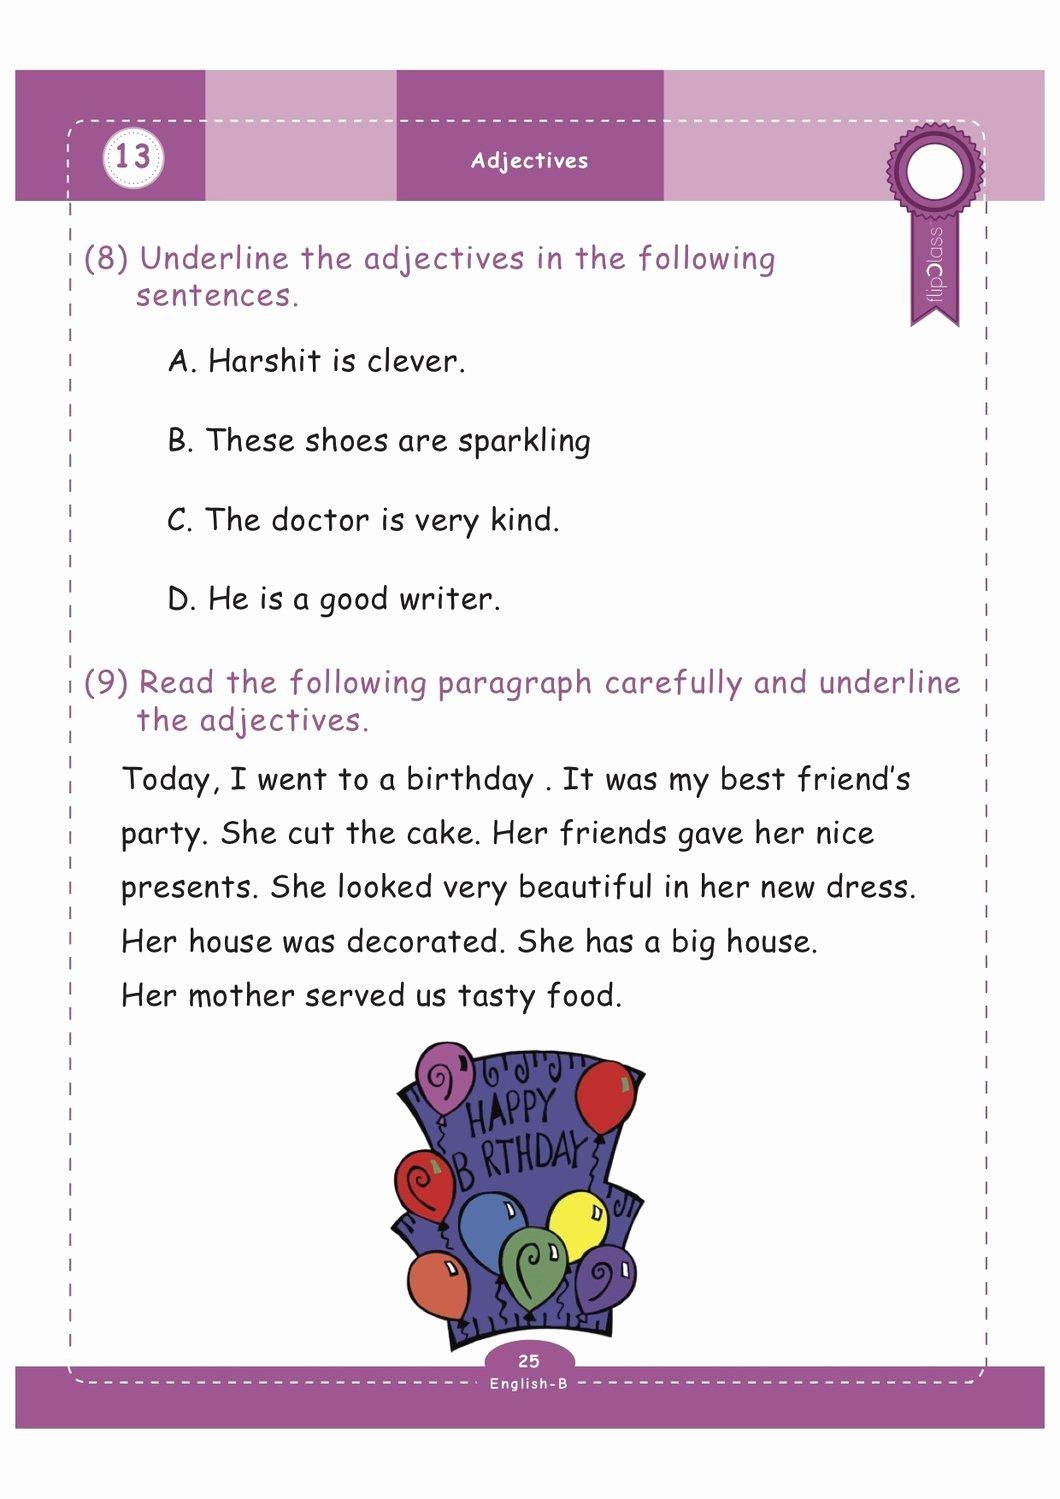 Science Worksheet for 1st Grade Beautiful Geniuskids Worksheets for Class 1 1st Grade